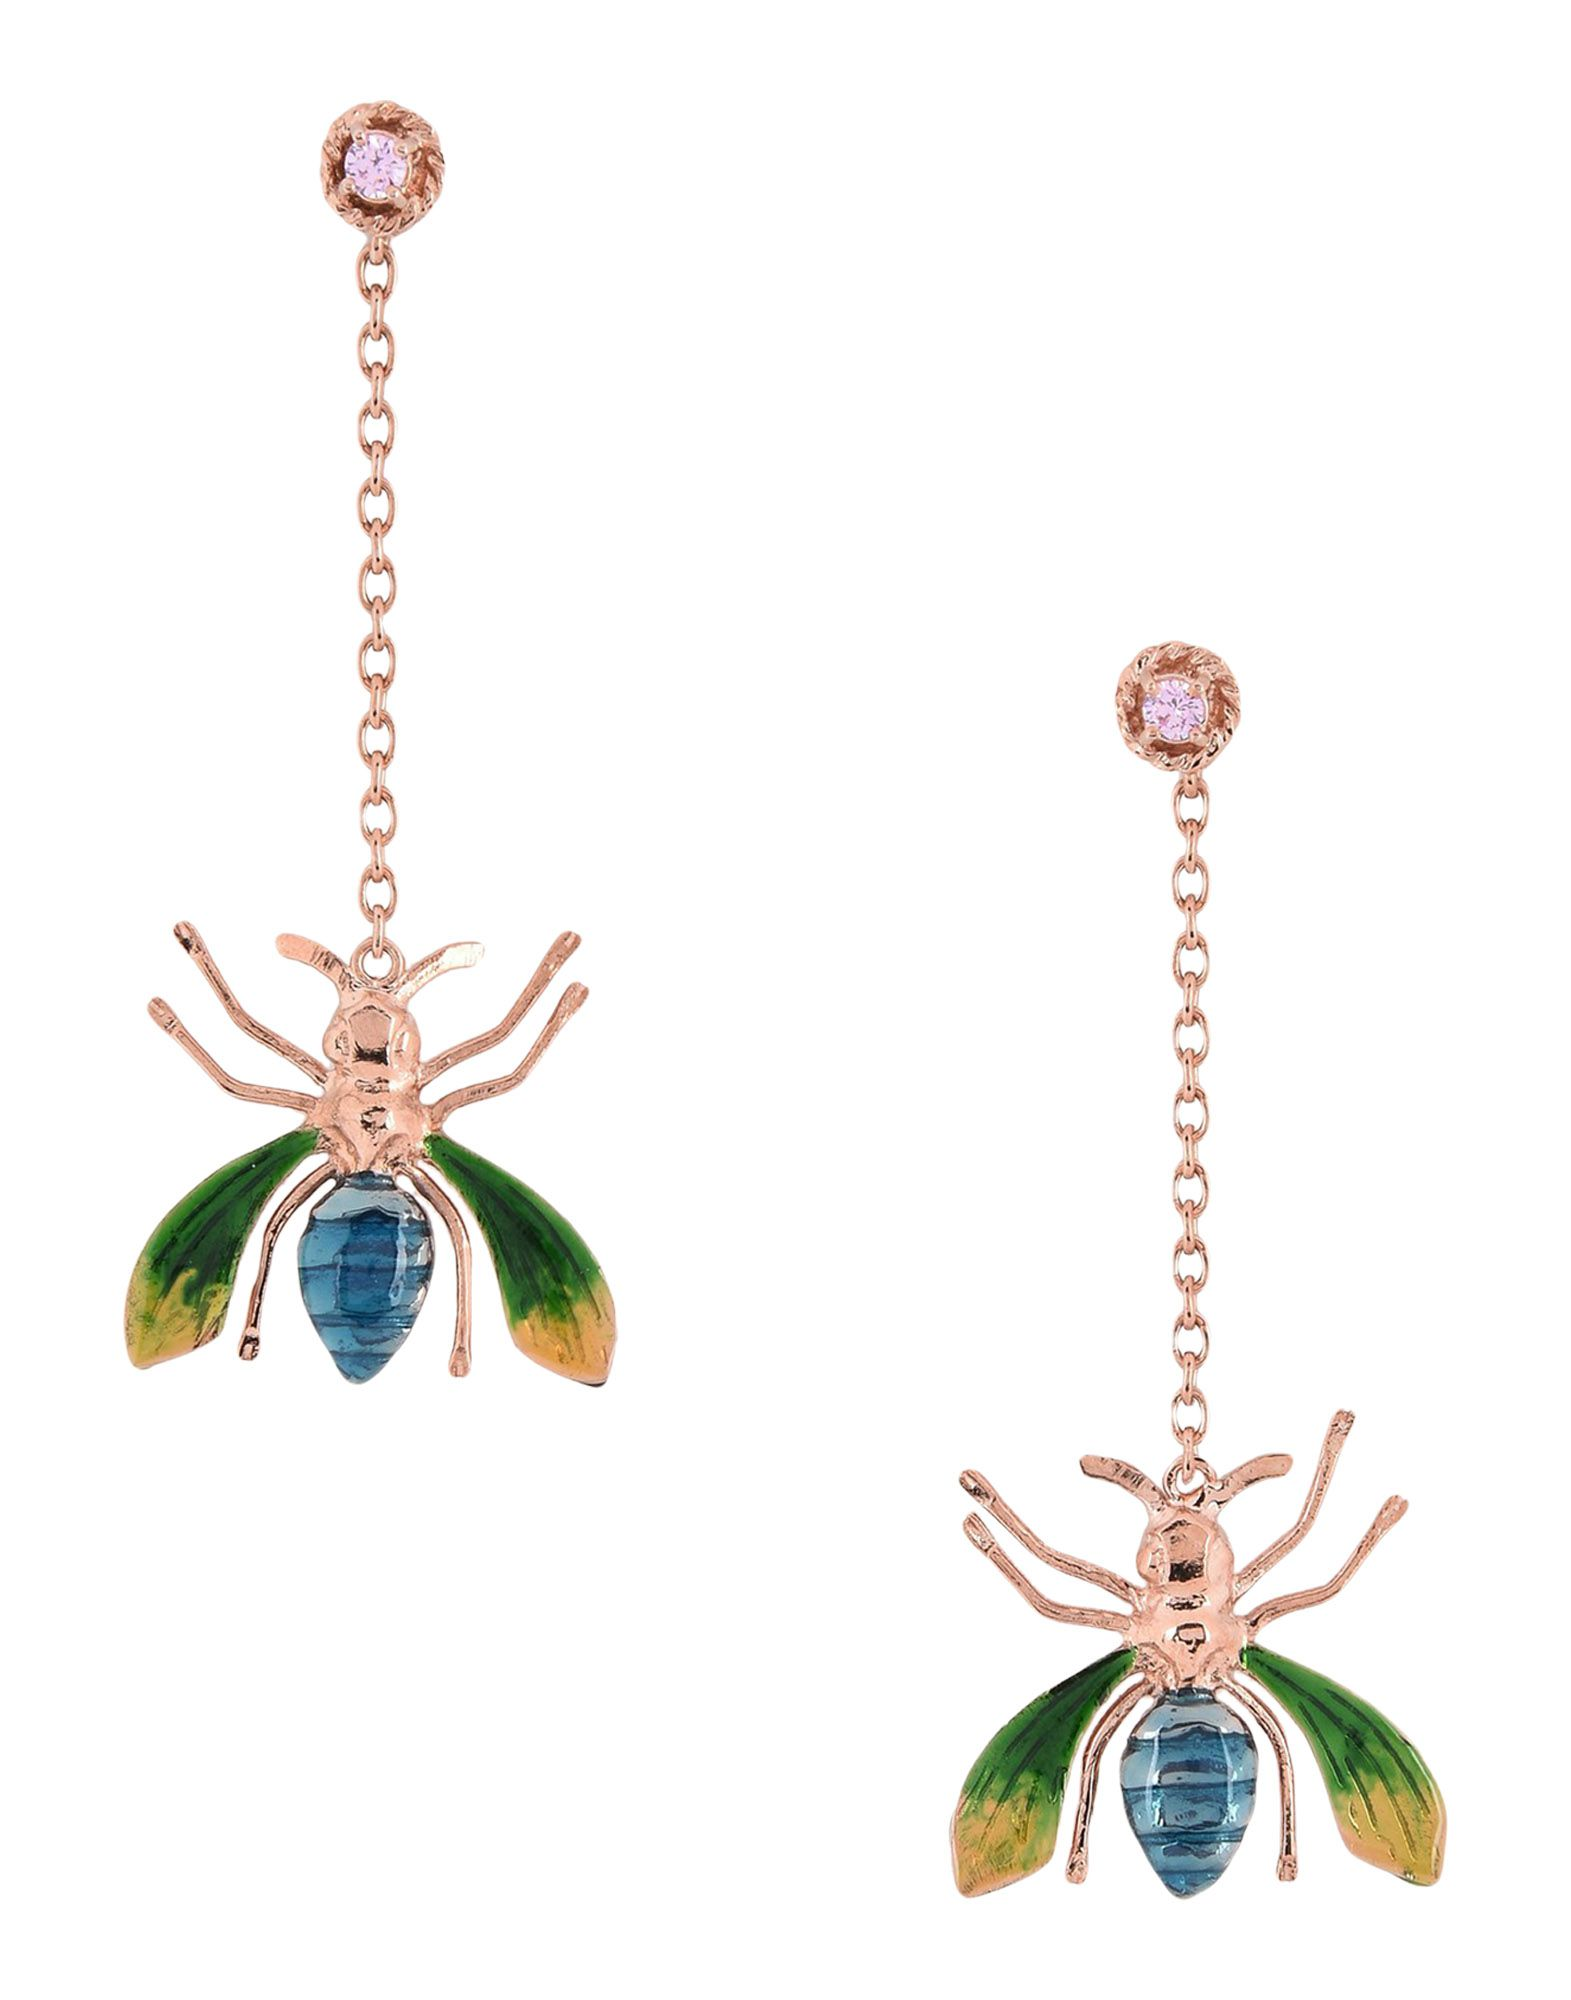 ILENIA CORTI VERNISSAGE Earrings in Copper